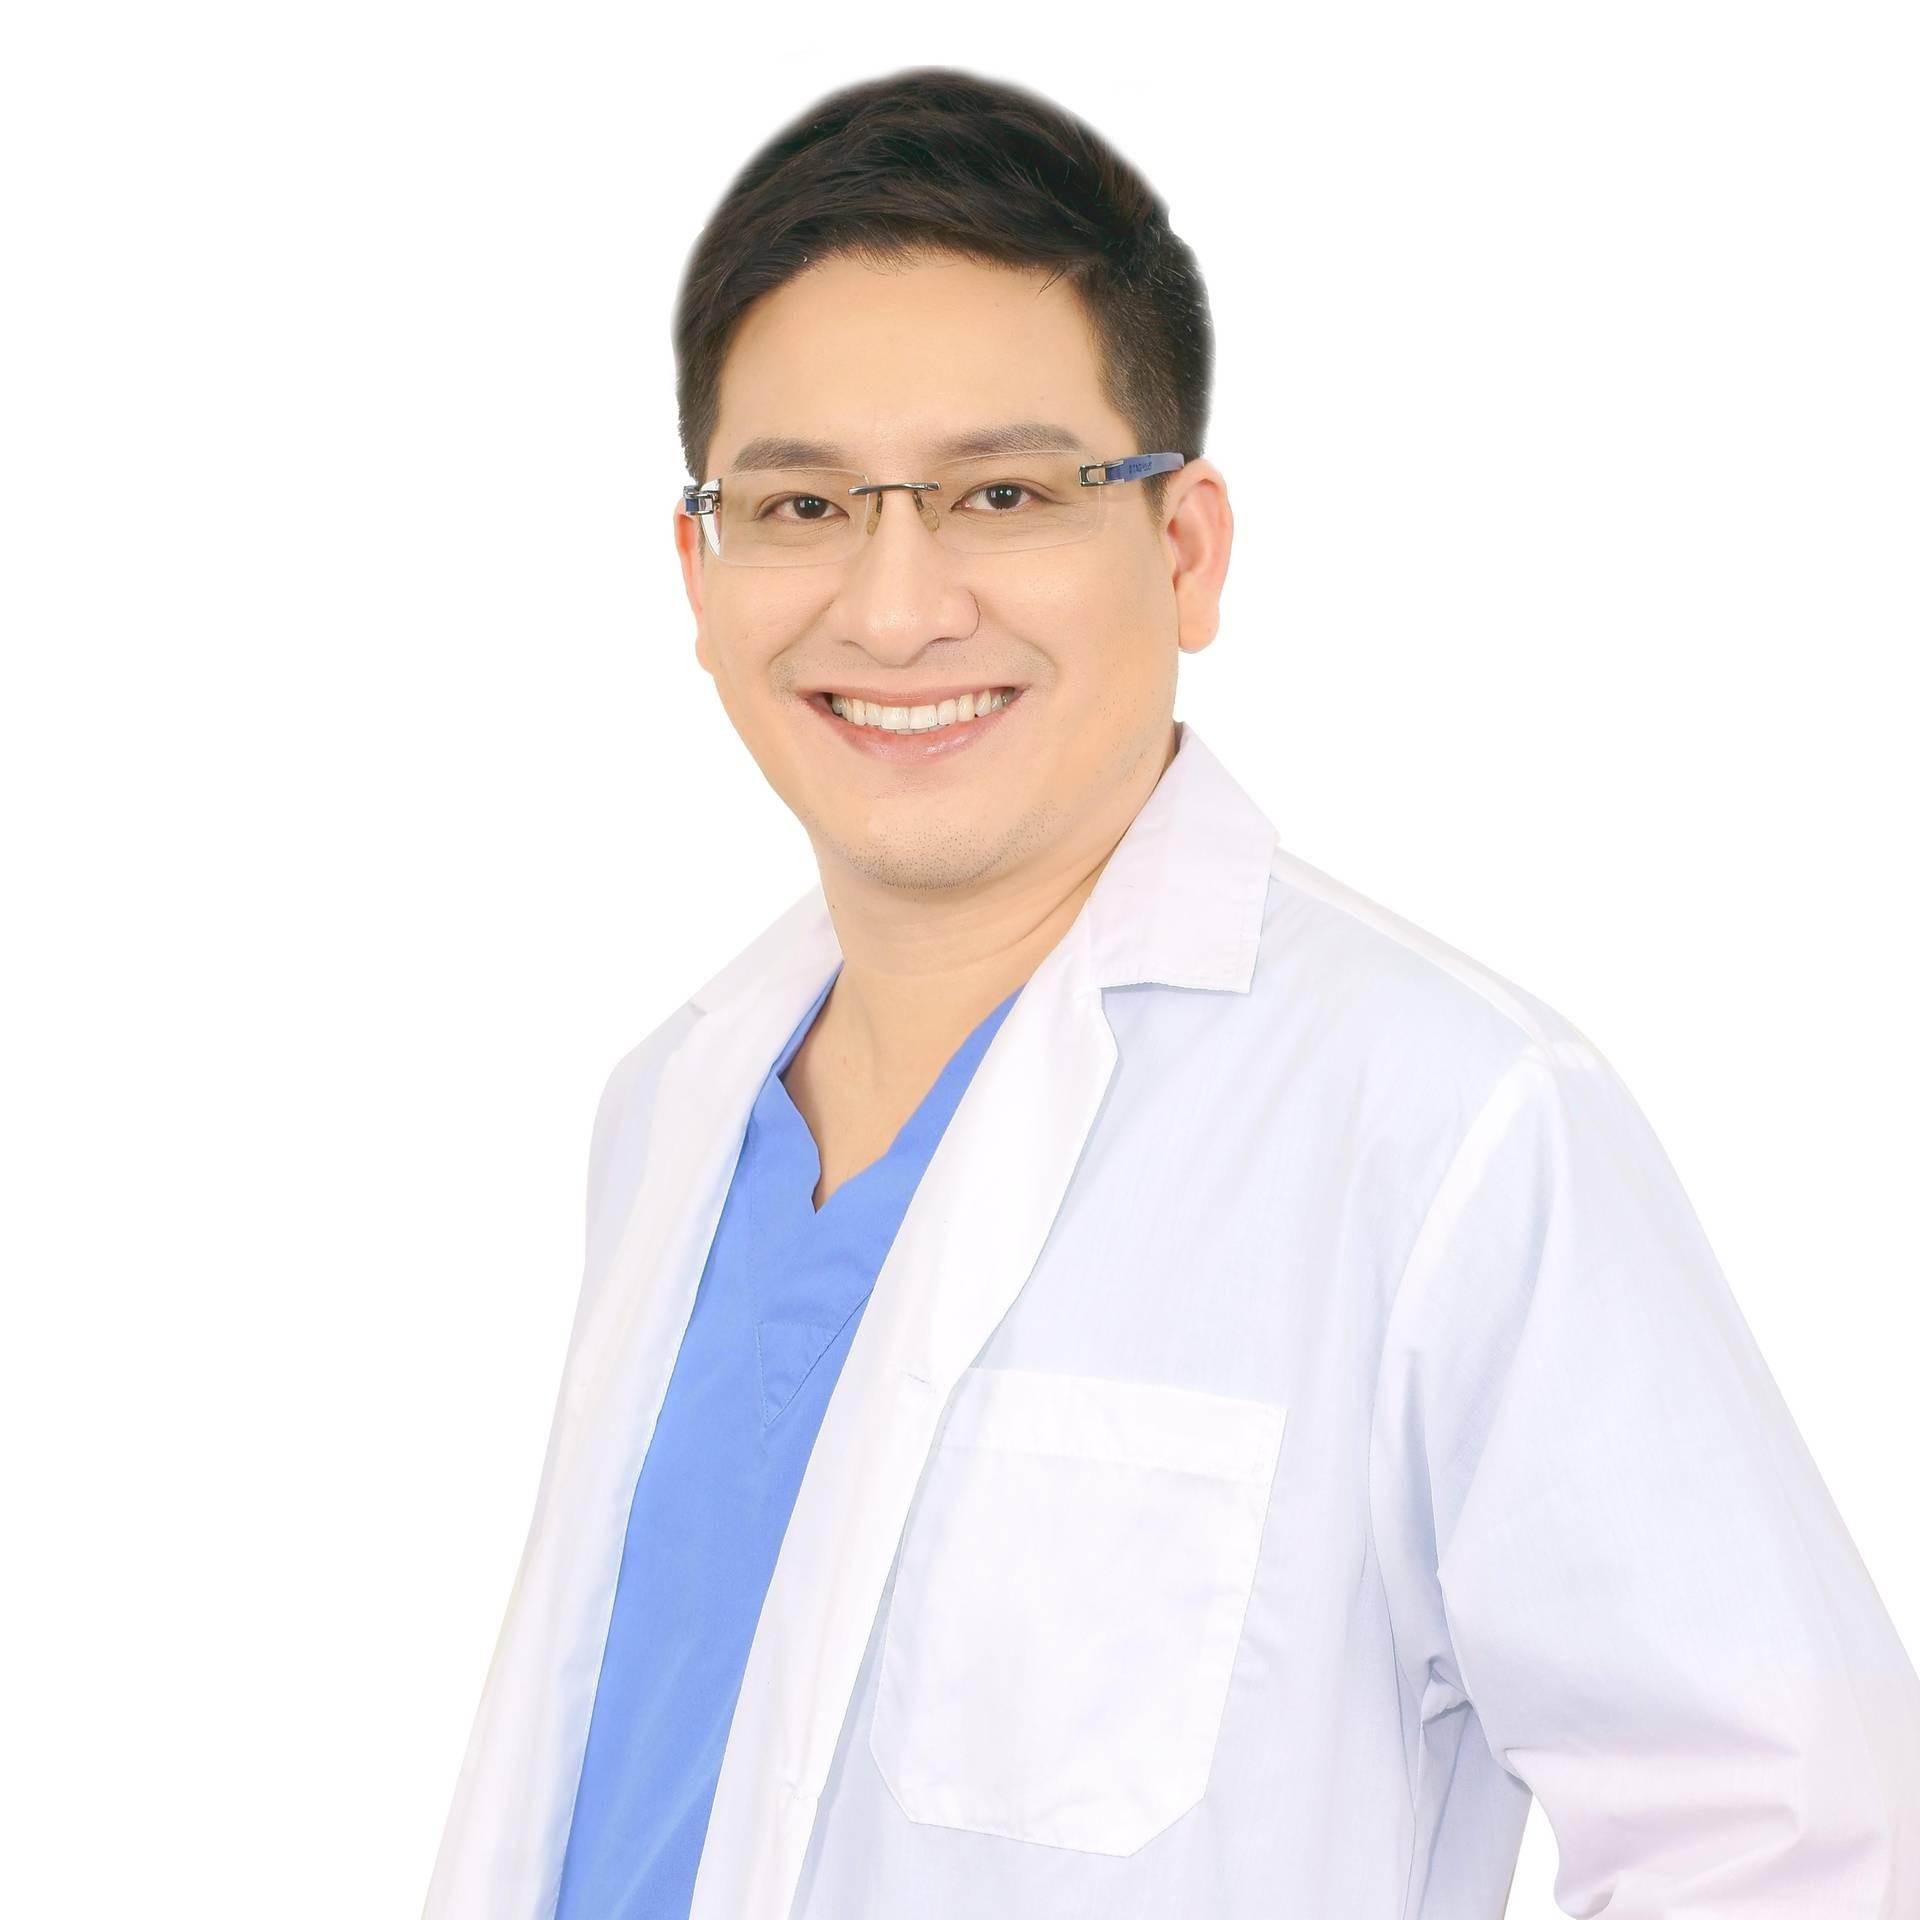 S45 Clinic